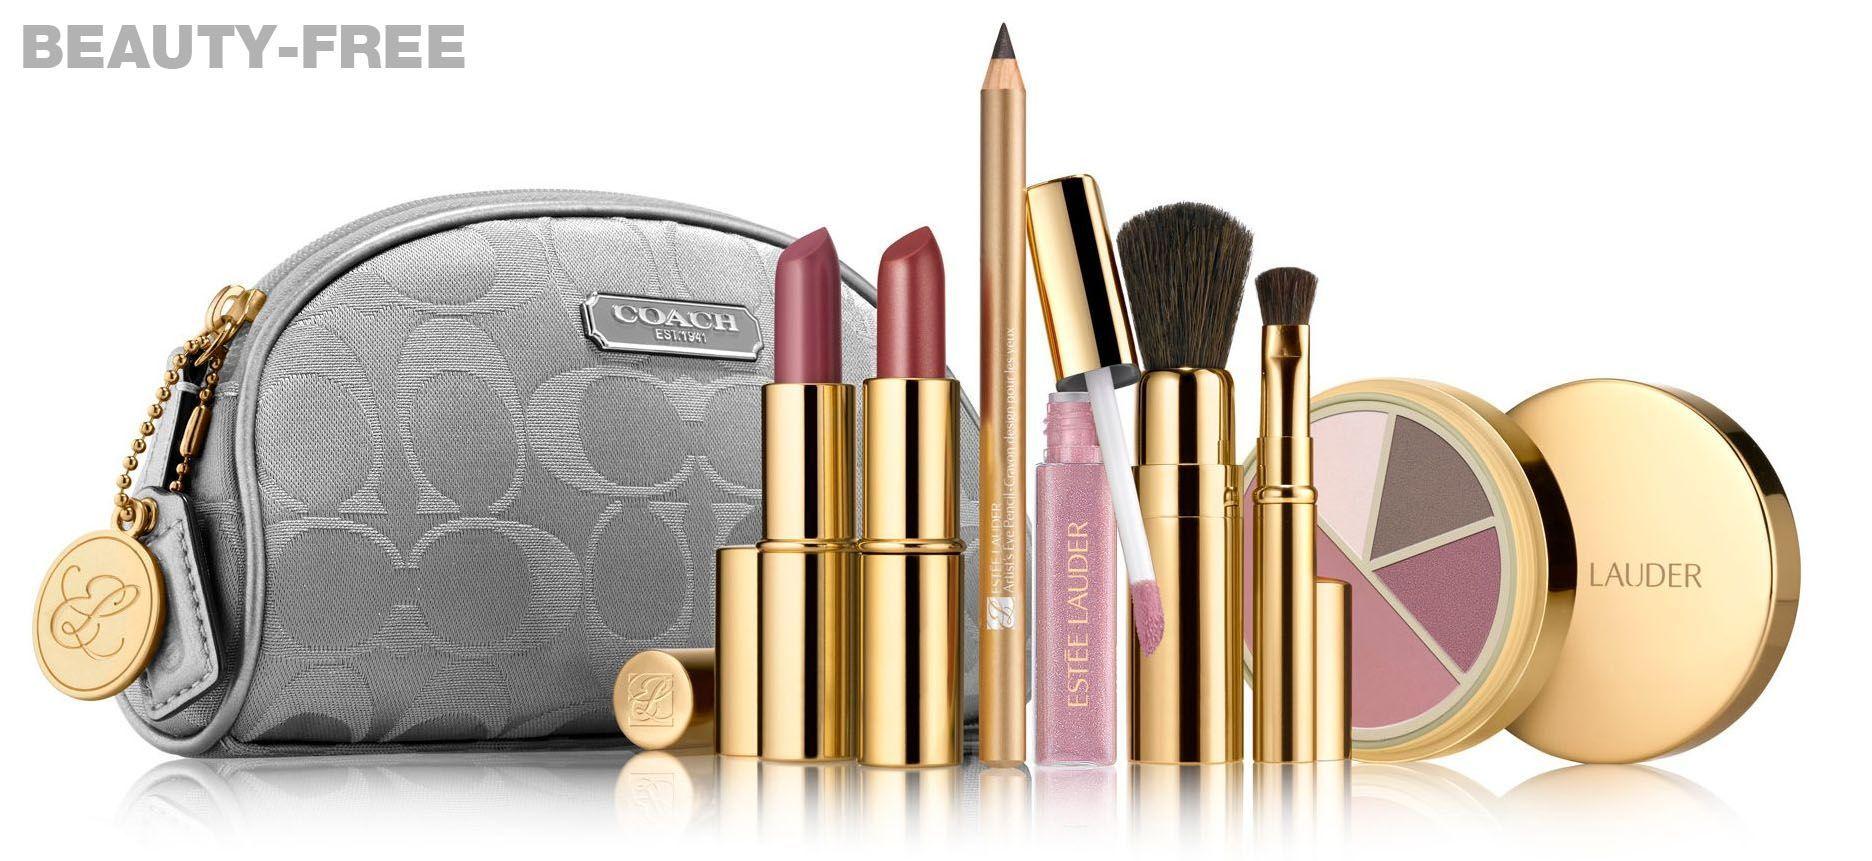 Cosmetics Perfume Estee lauder makeup kit in Poland in